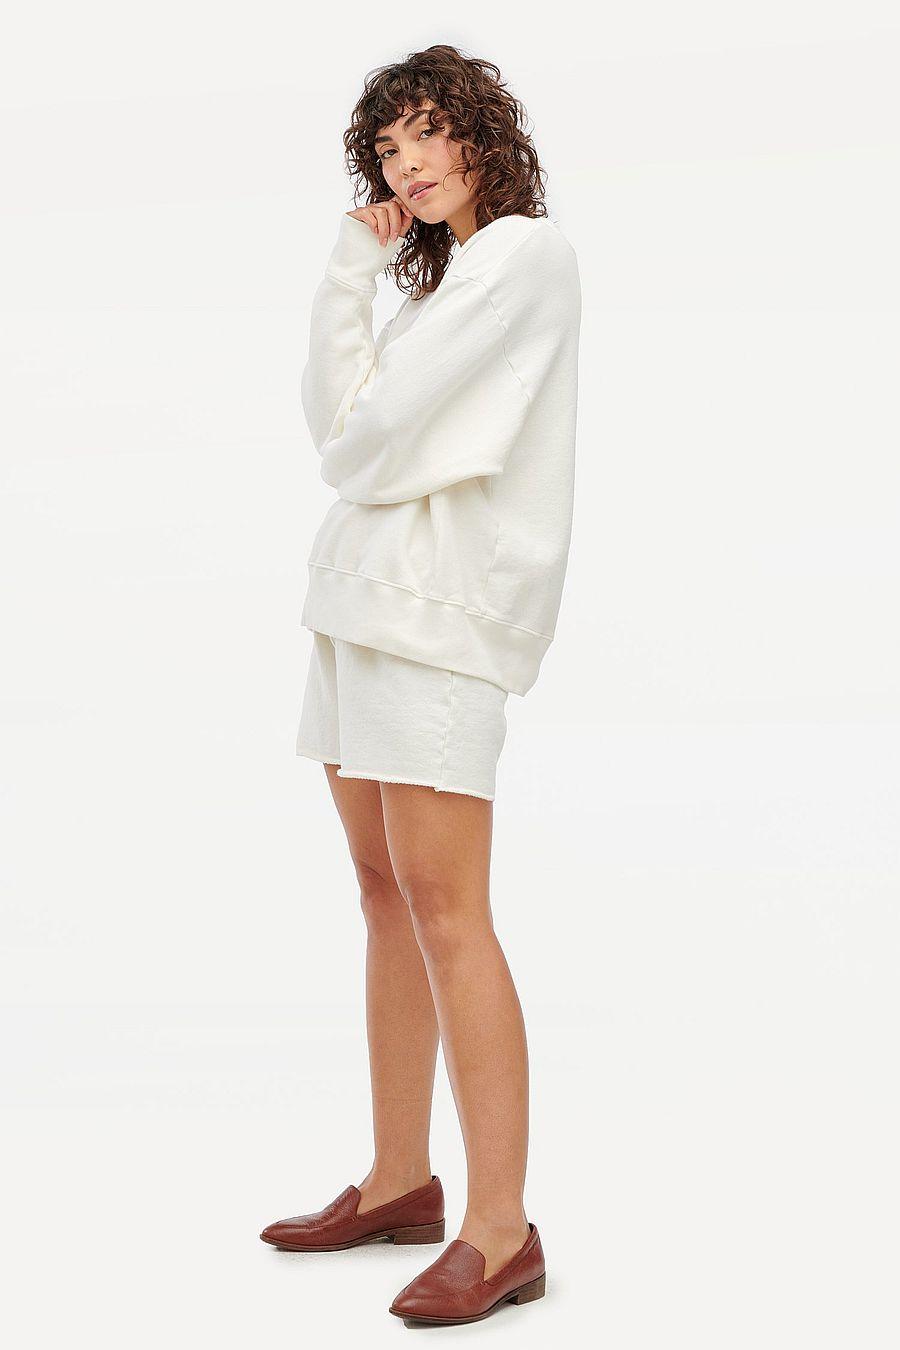 LACAUSA Clothing Slater Sweatshirt - Oatmilk